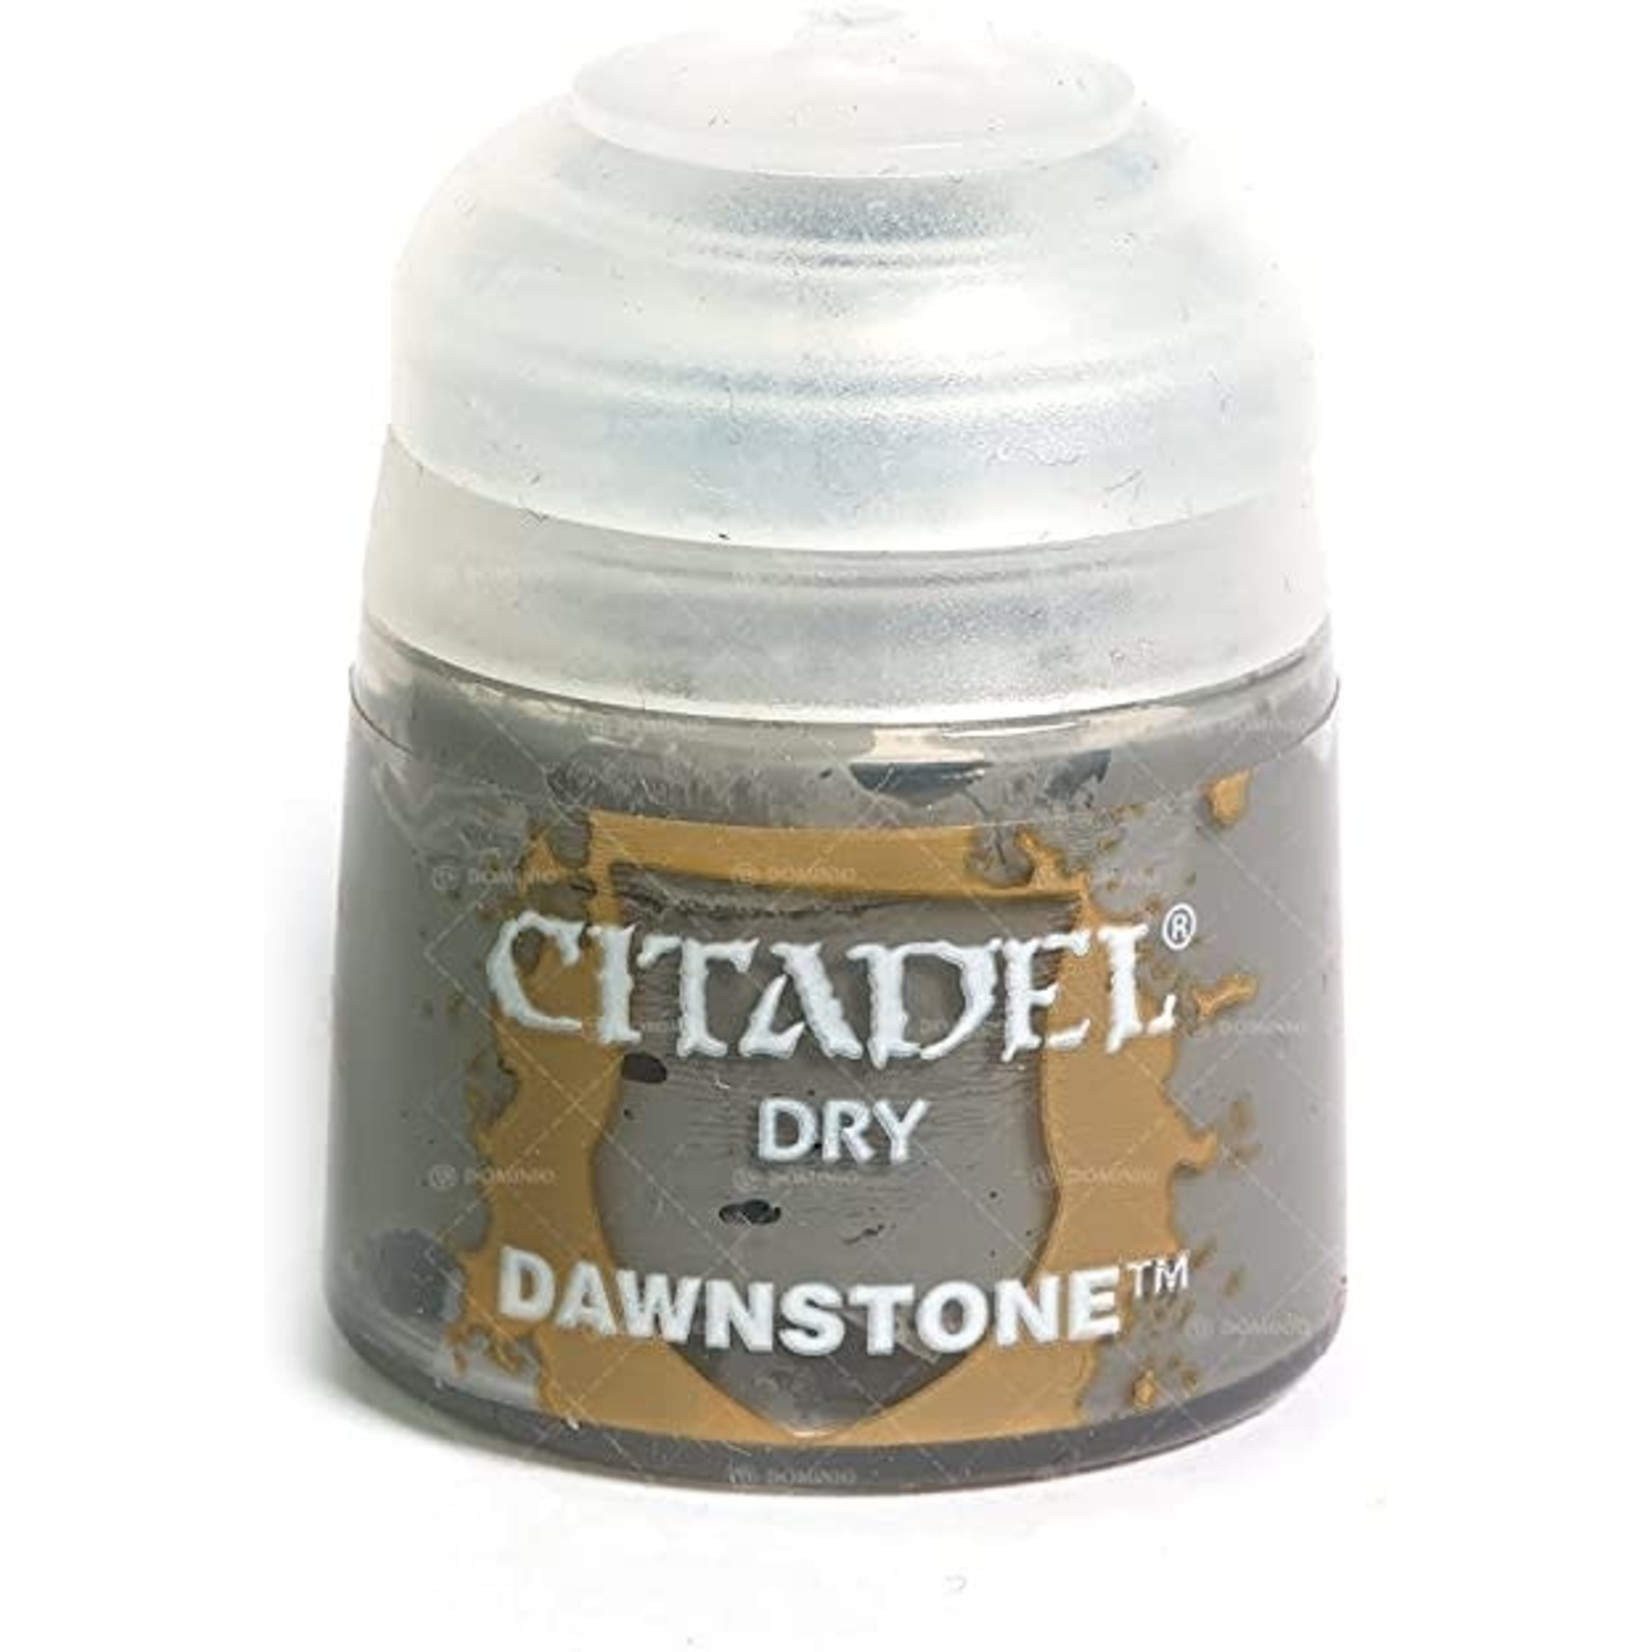 Games Workshop Citadel Paint: Dawnstone 12ml (Dry)